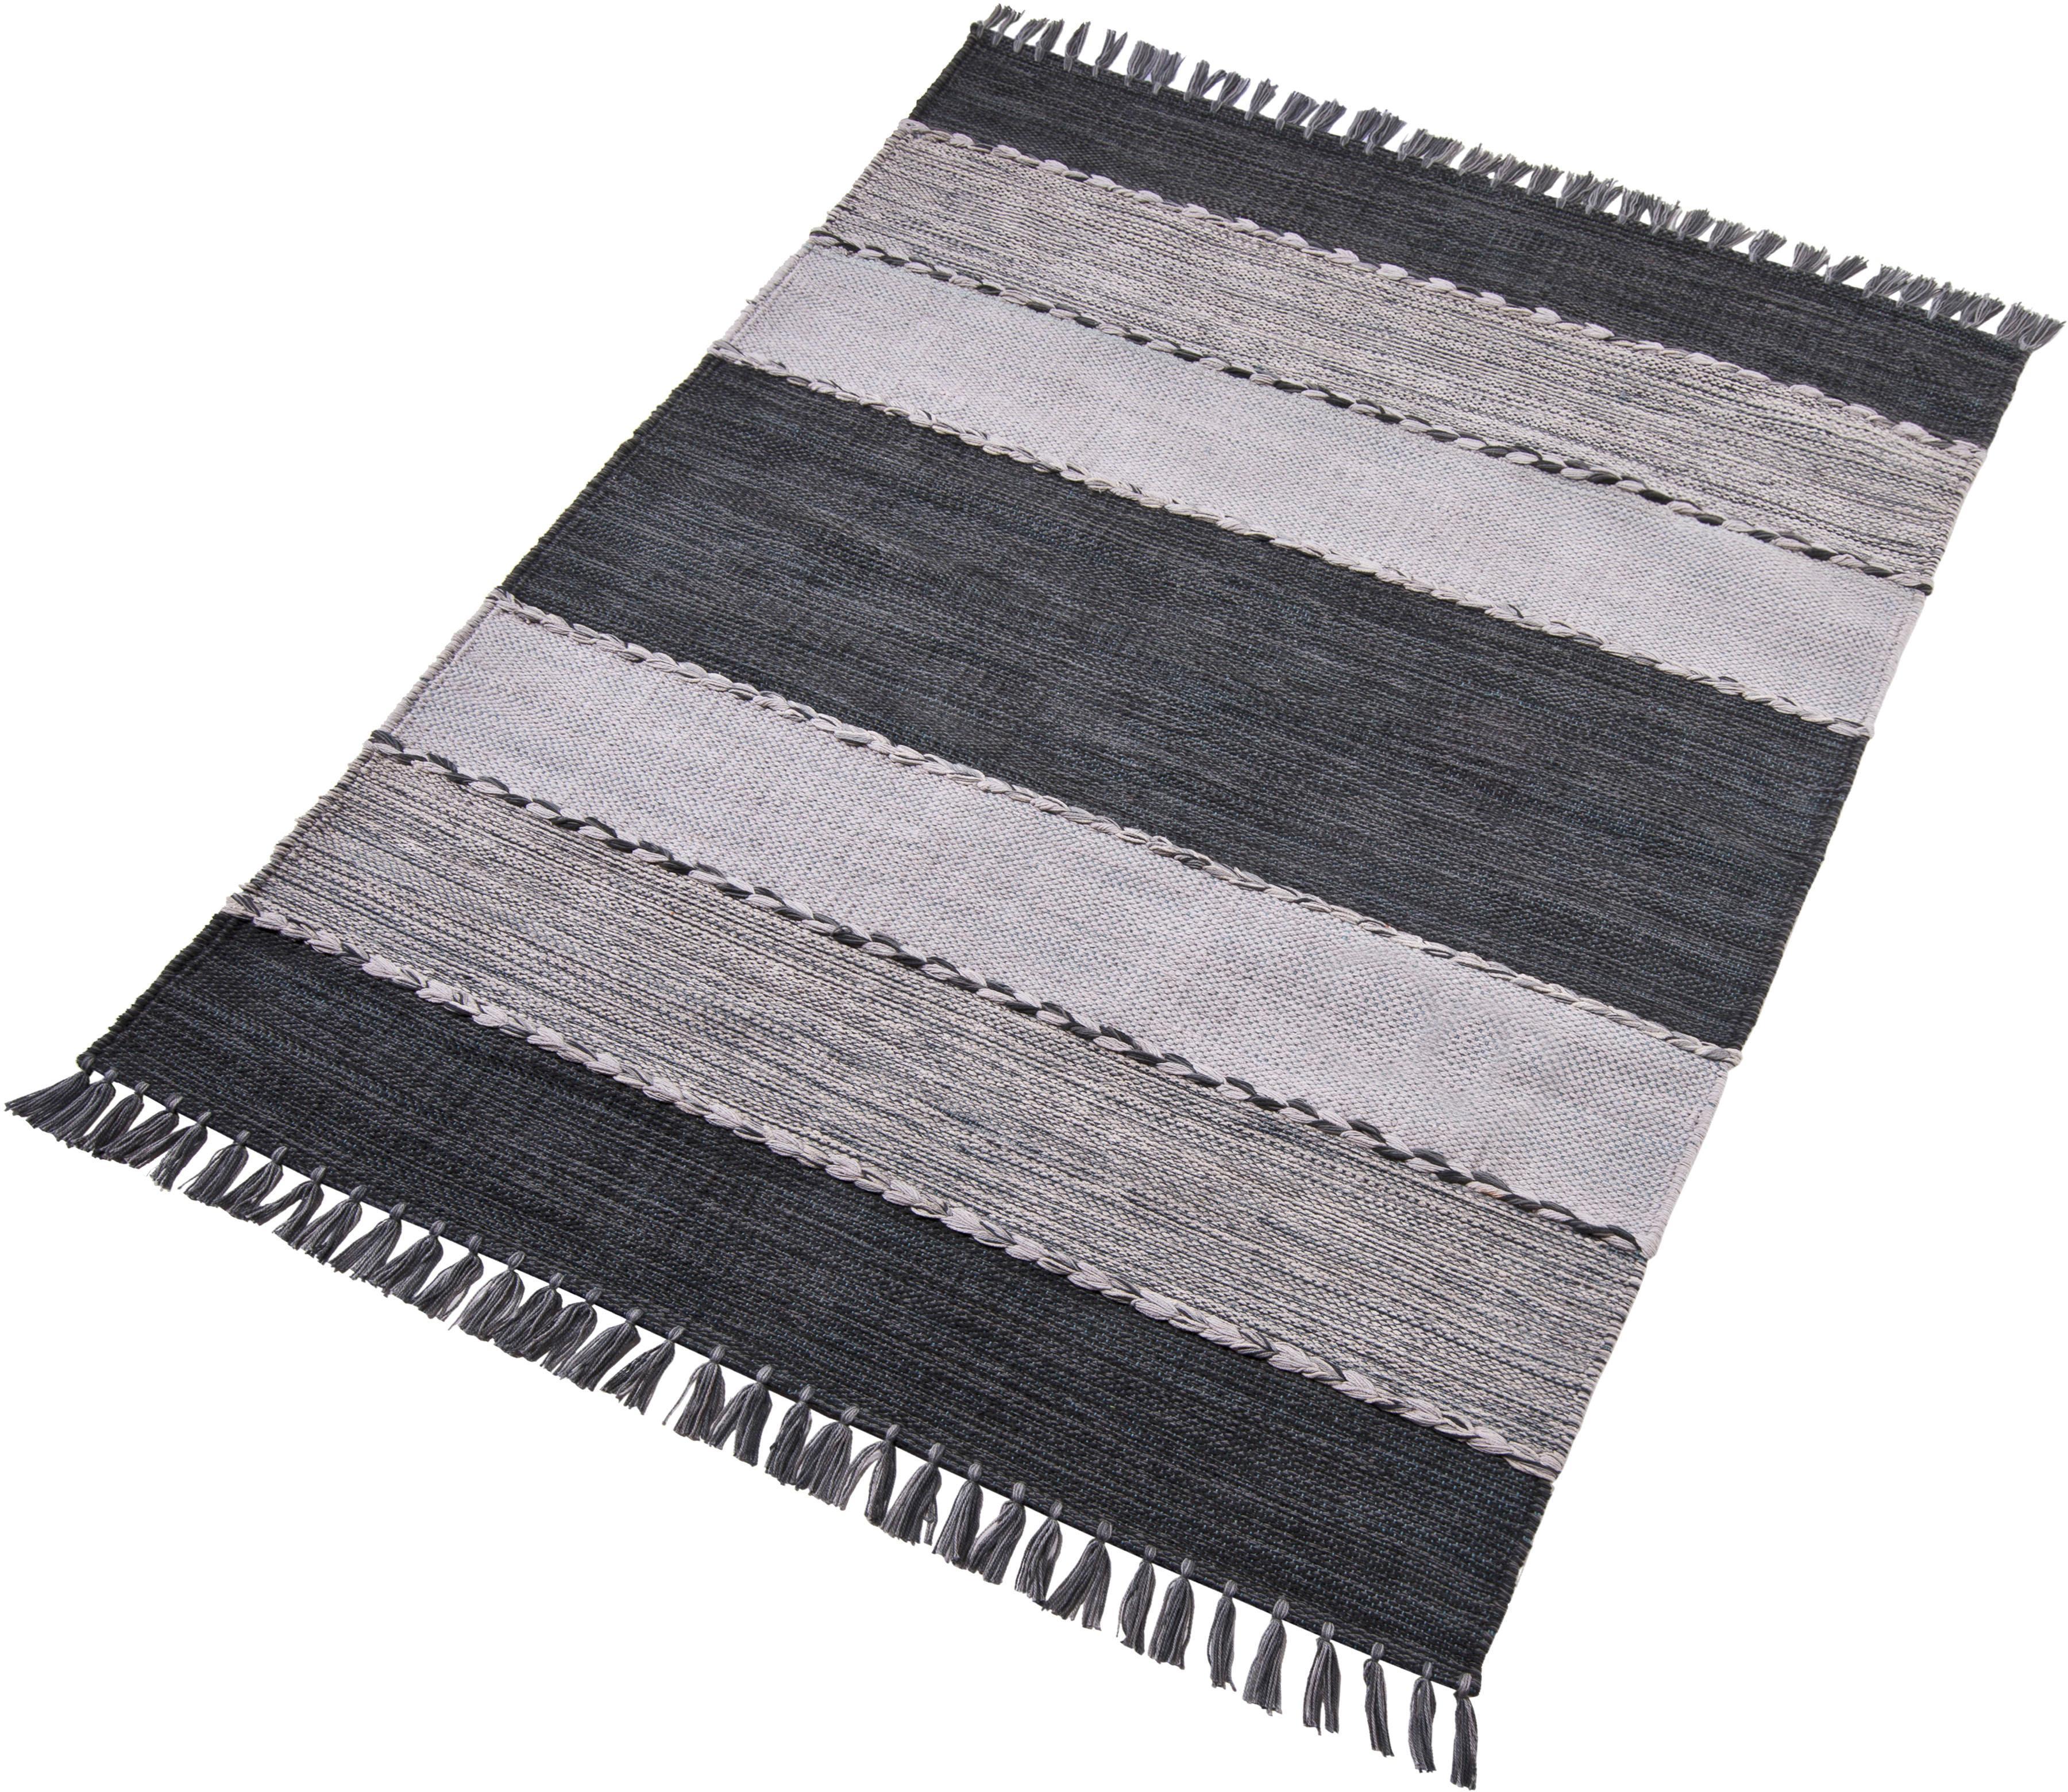 Teppich Eden Home affaire Collection rechteckig Höhe 5 mm handgewebt